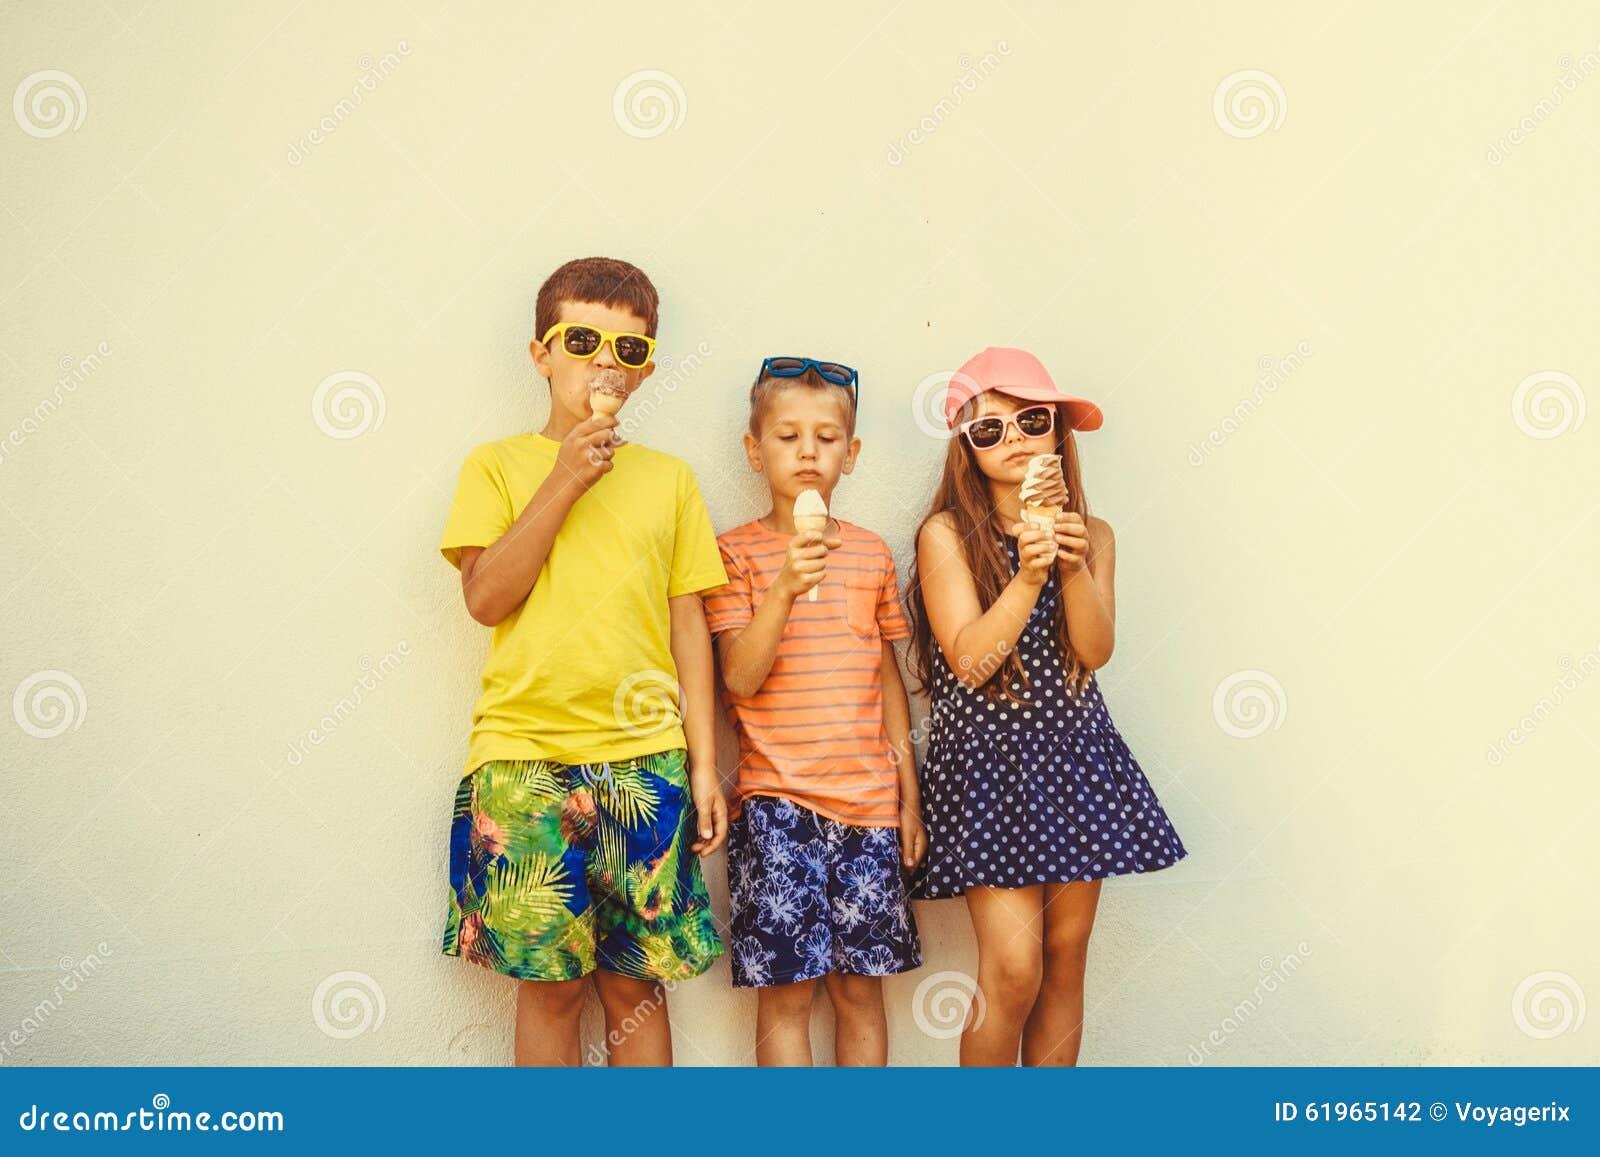 kids boys and little girl eating ice cream stock photo